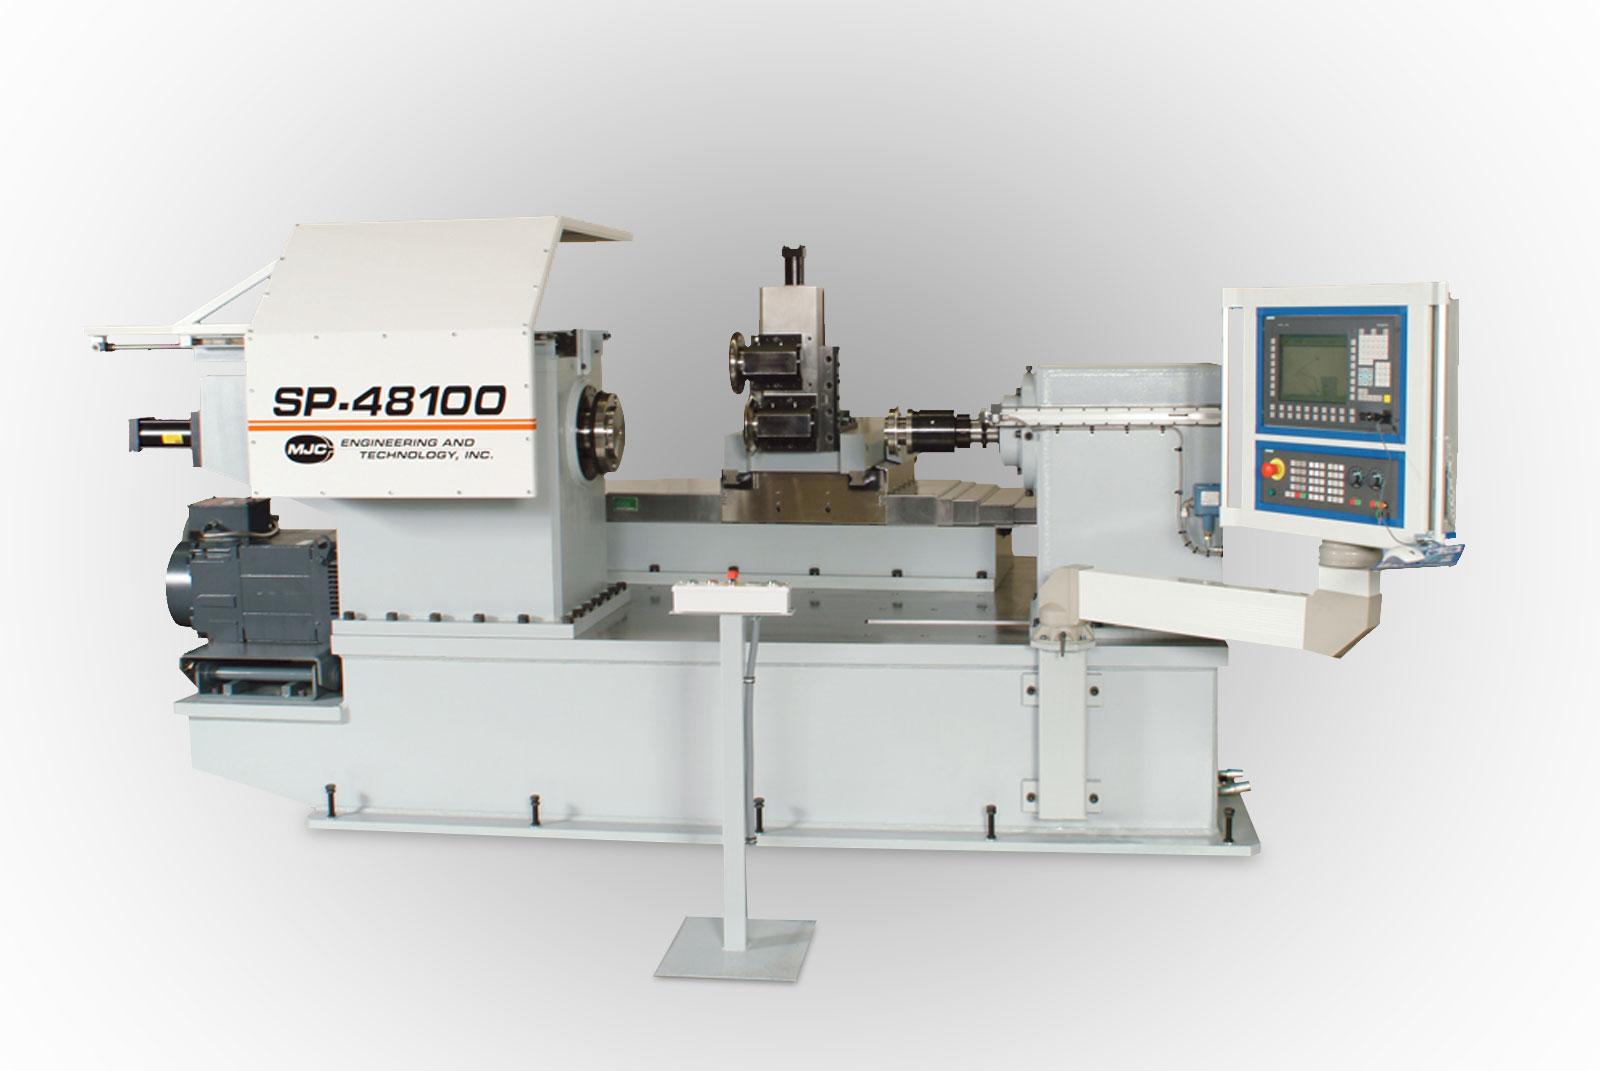 MJC-SP-48100